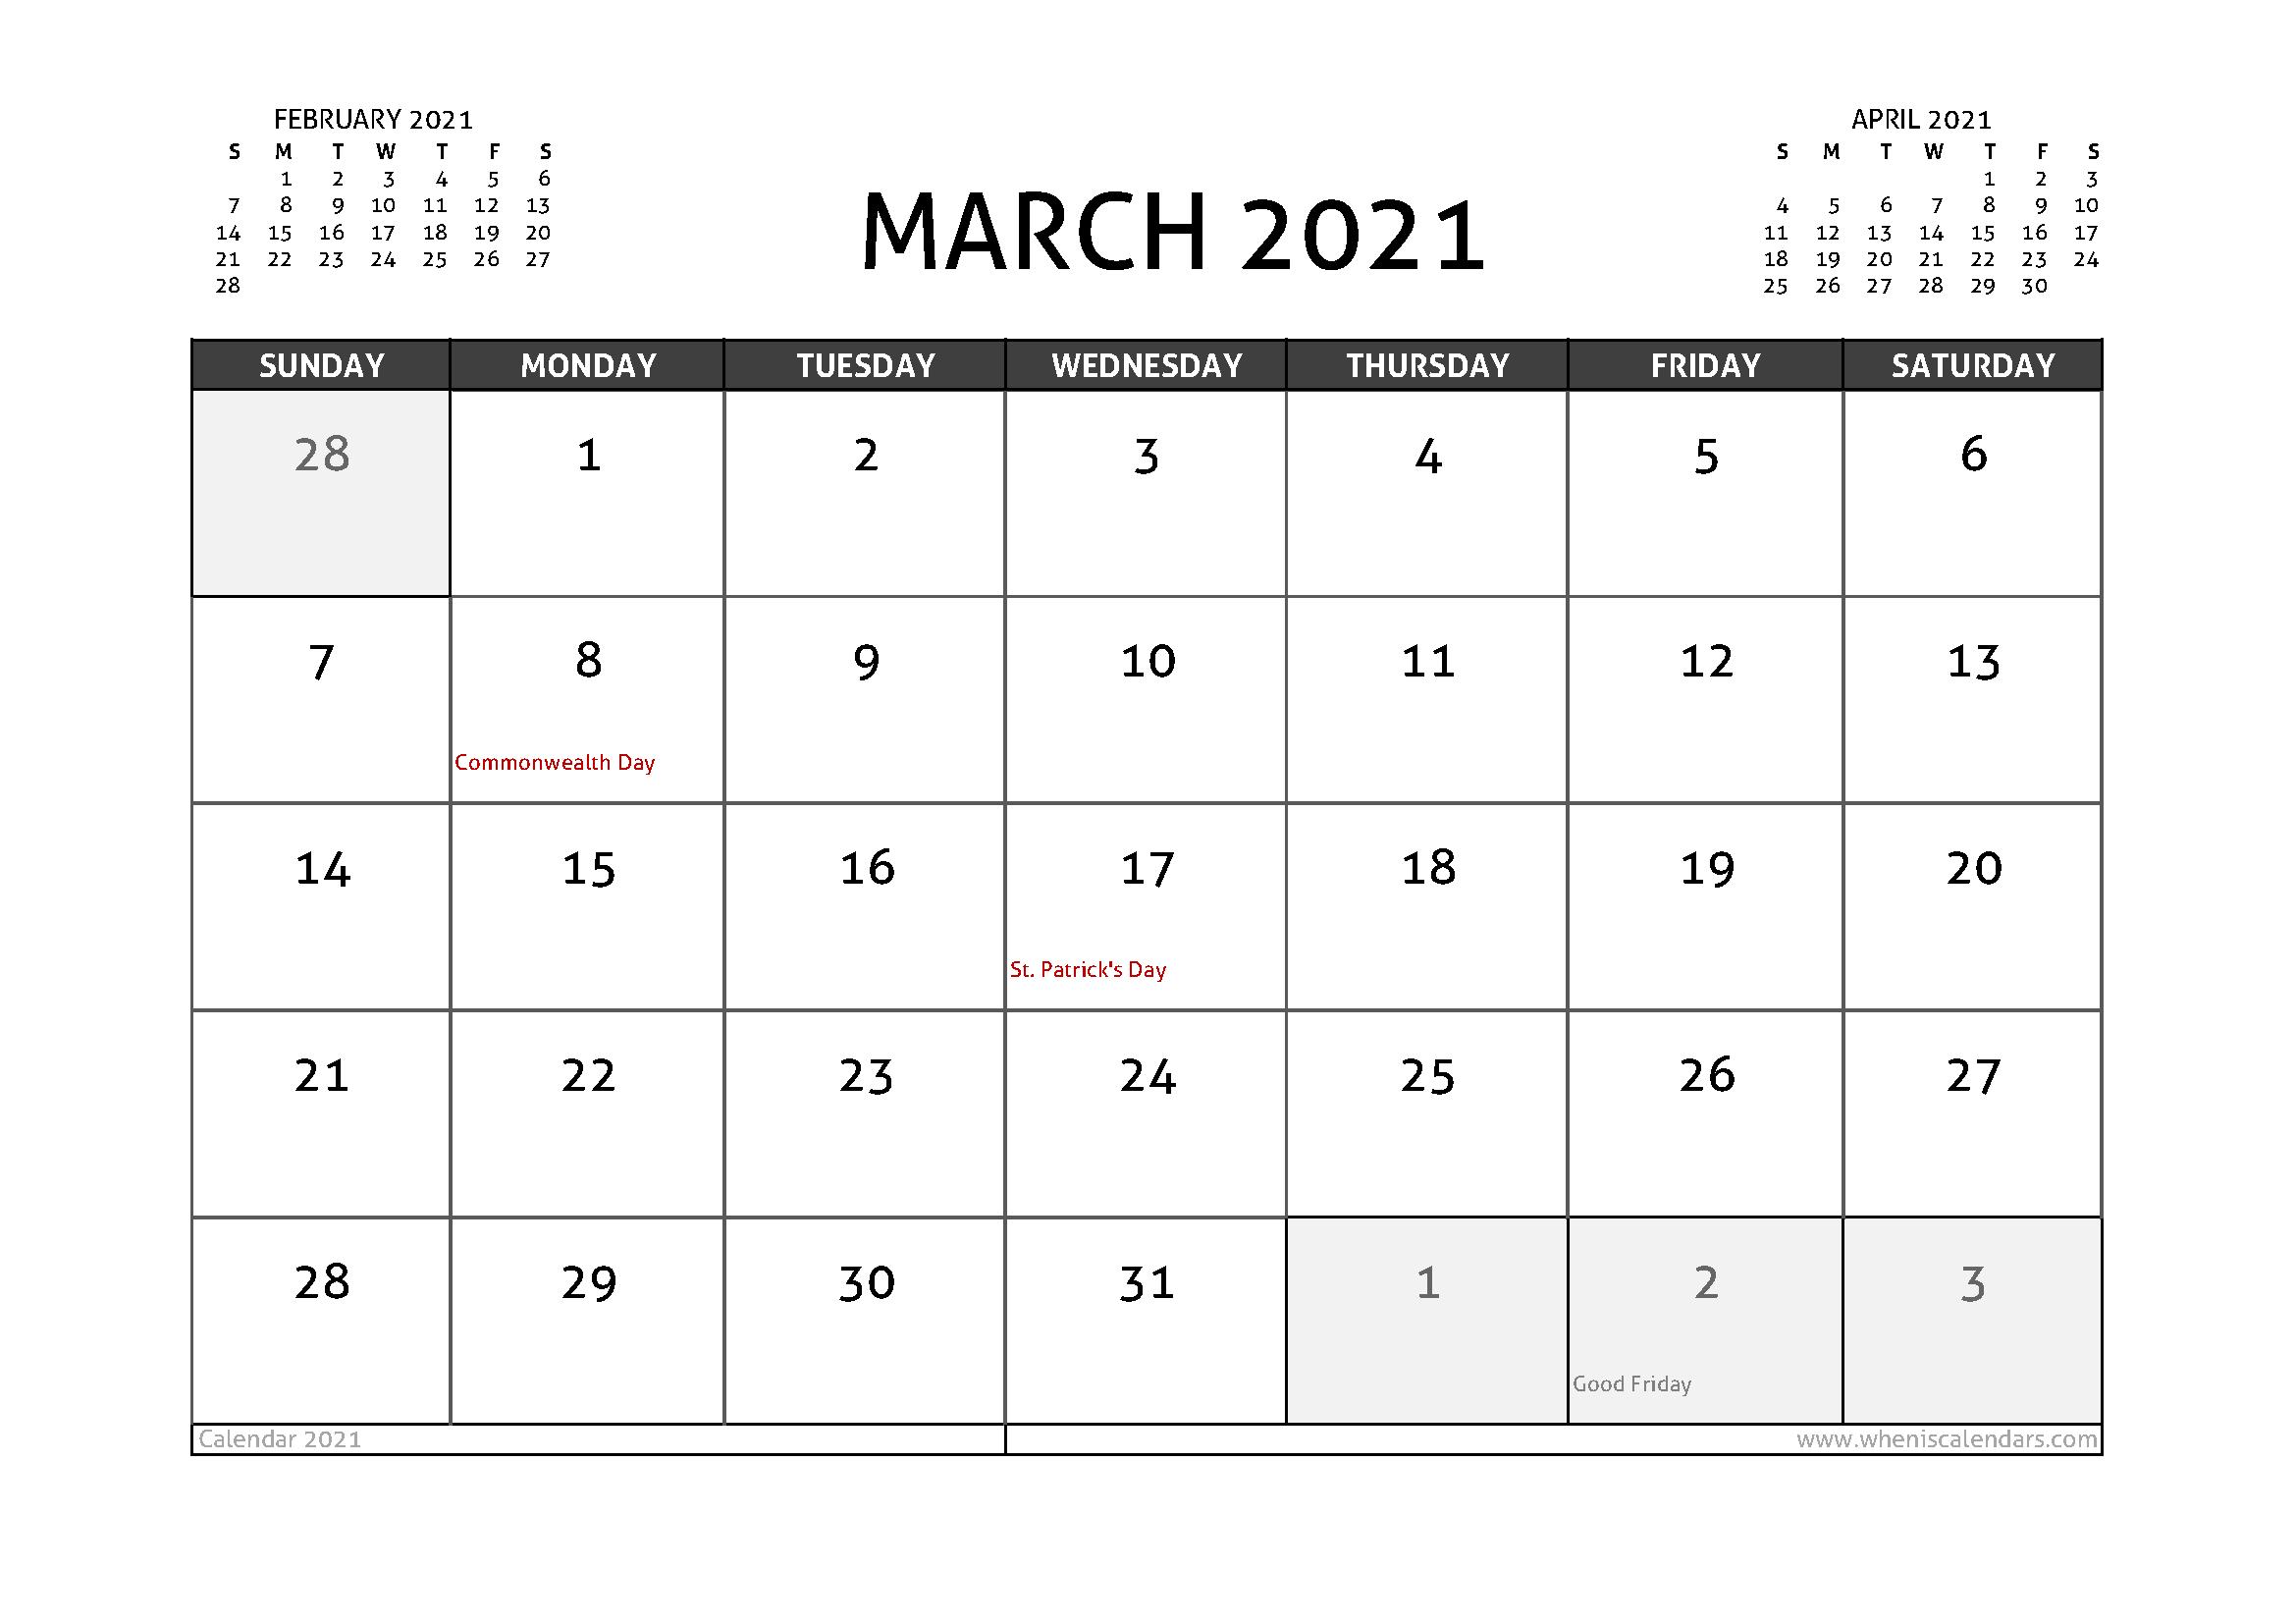 March 2021 Calendar Canada with Holidays